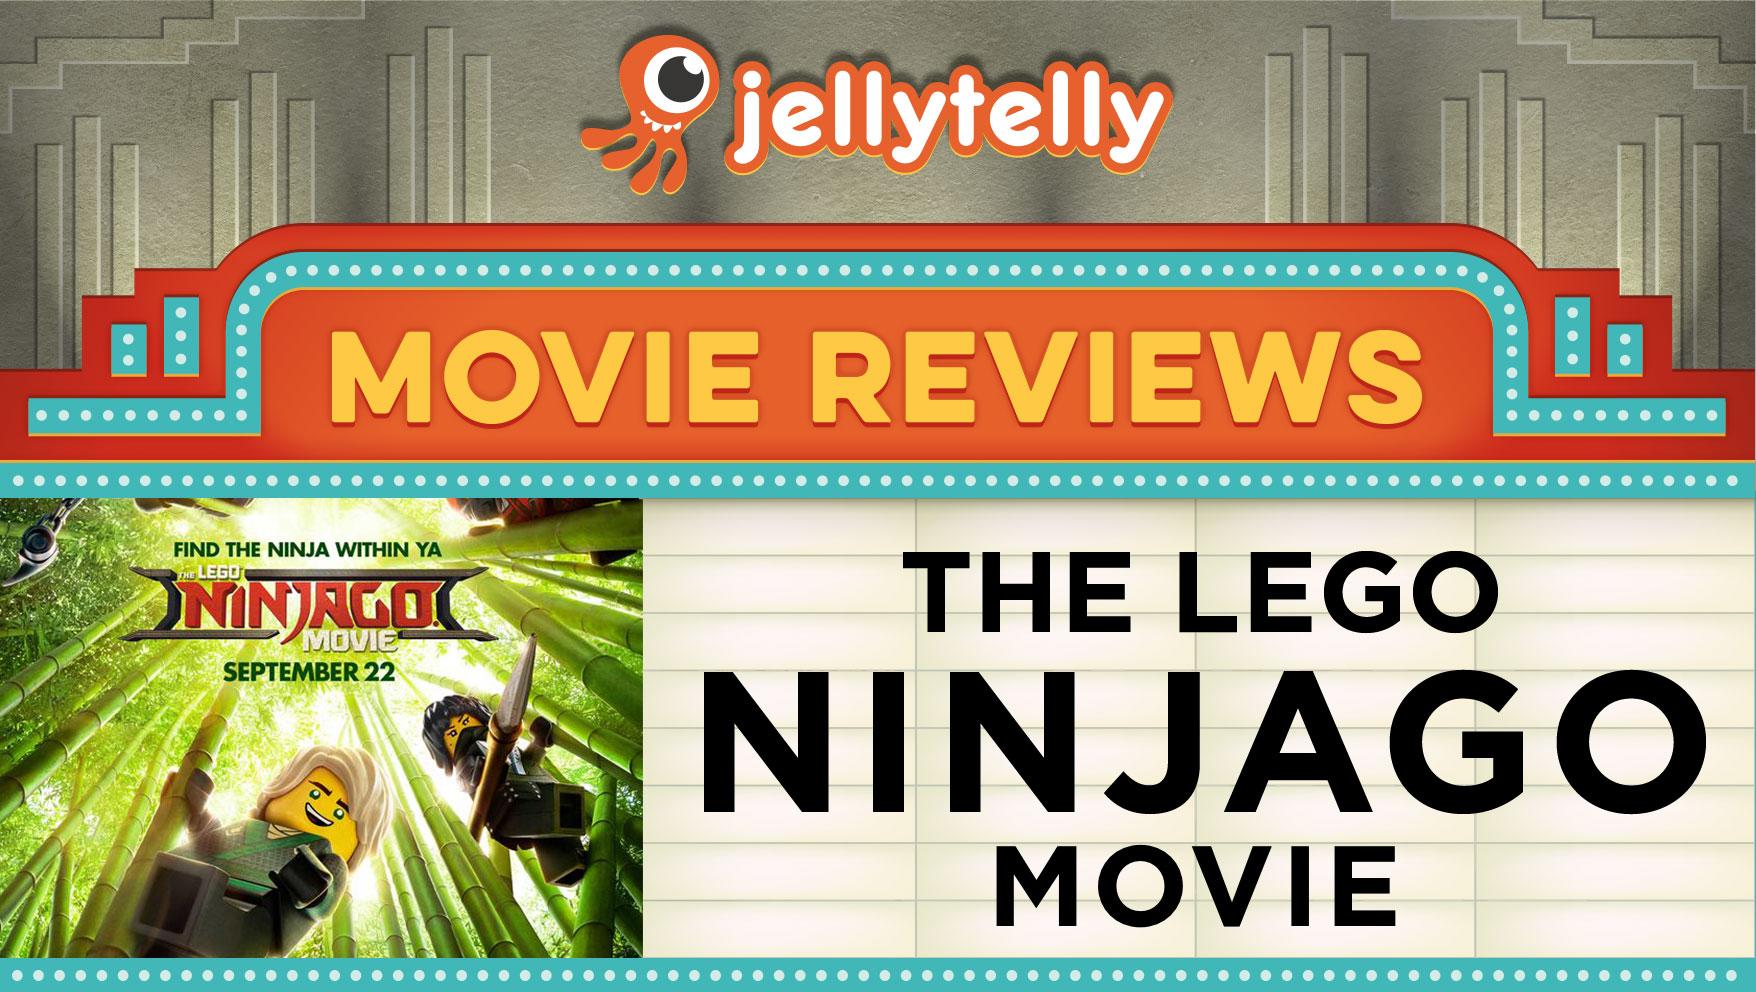 JellyTelly Movie Review: The Lego Ninjago Movie